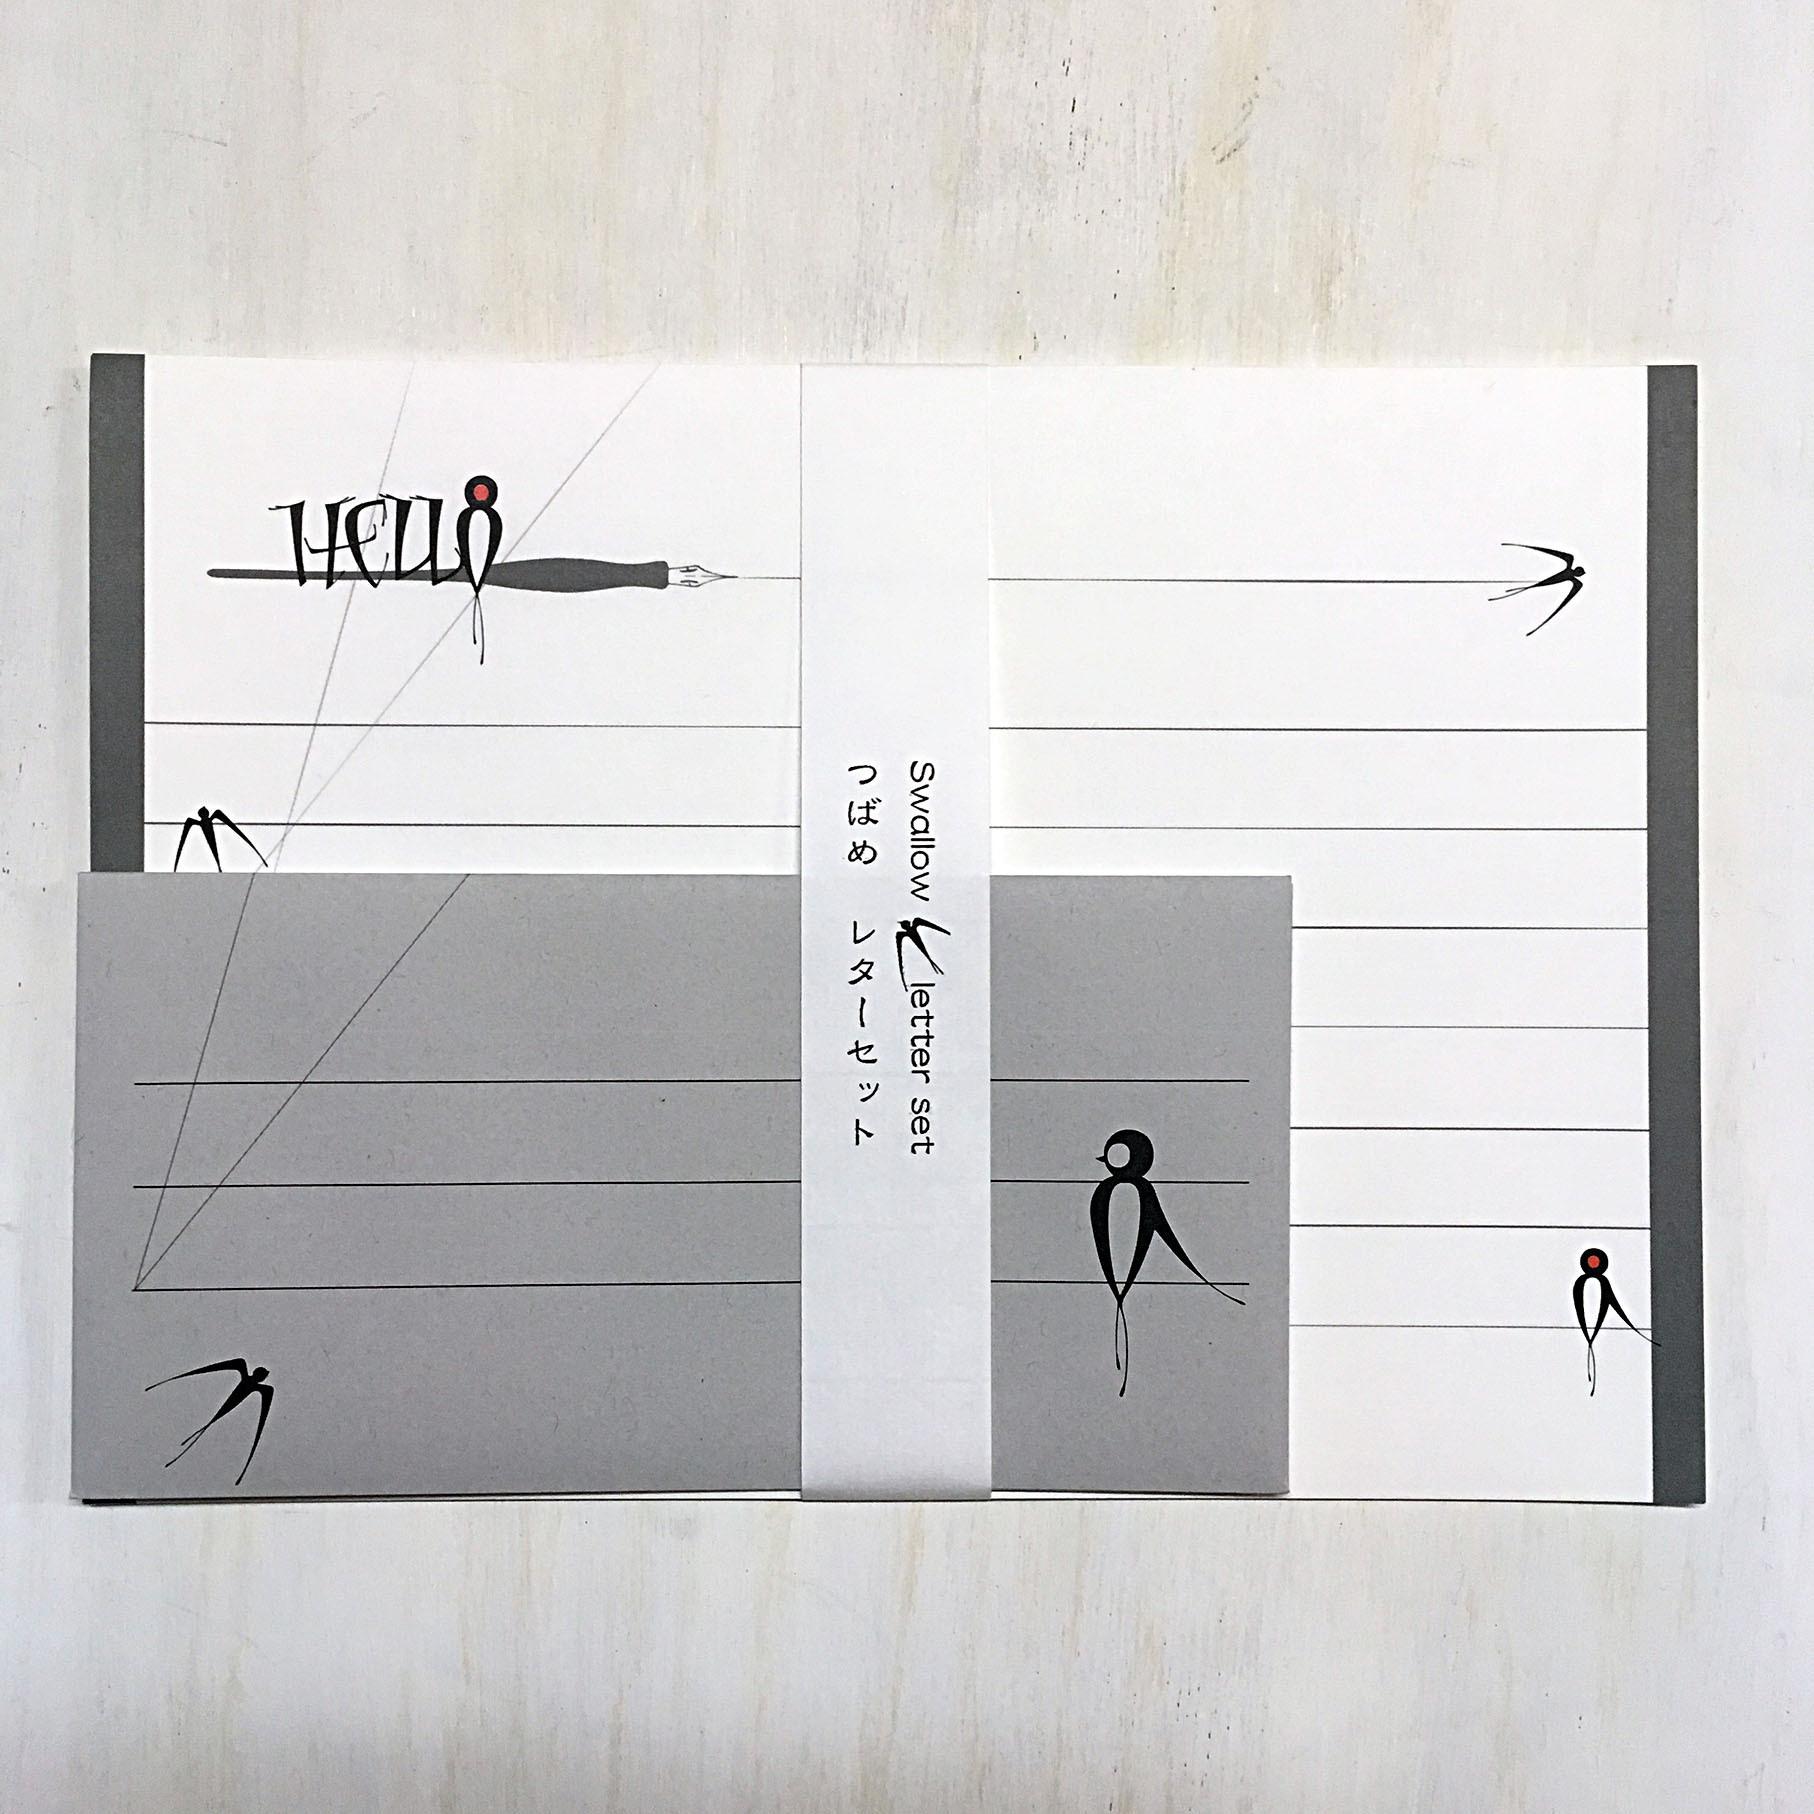 Swallow letterset(つばめ・レターセット)